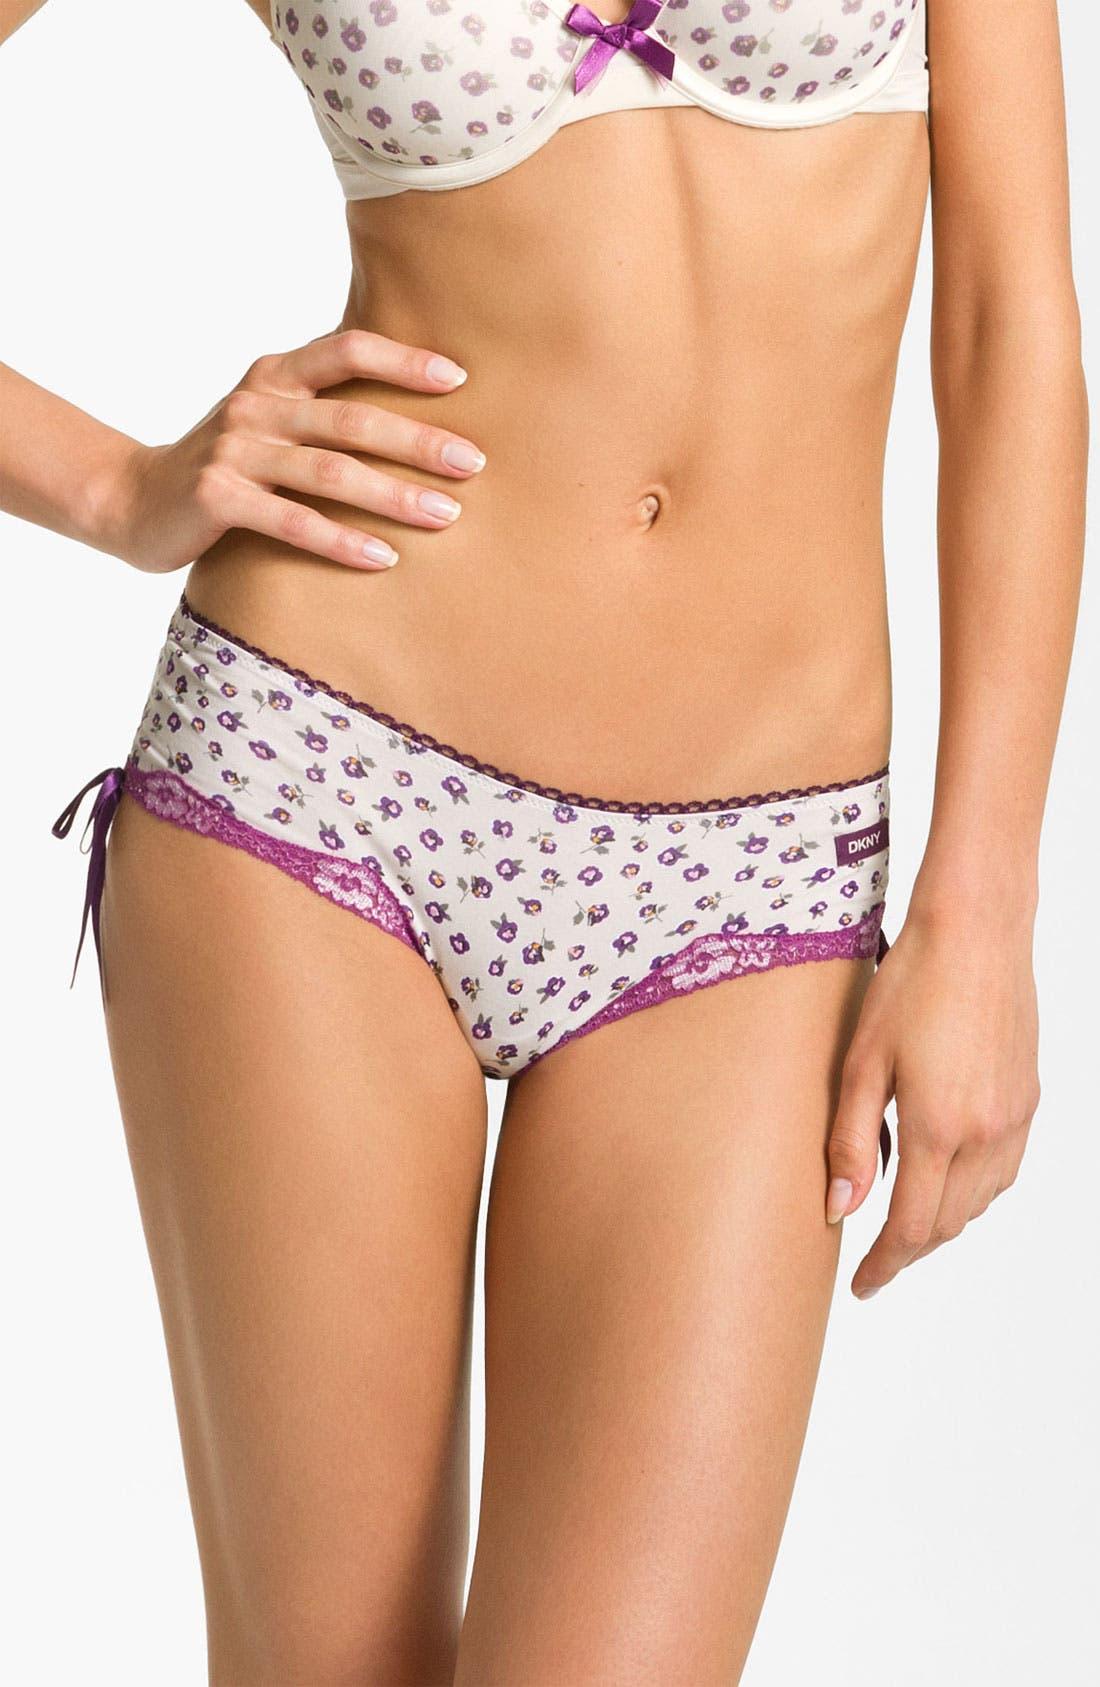 Main Image - DKNY 'Cutie' Cotton Bikini (3 for $27)